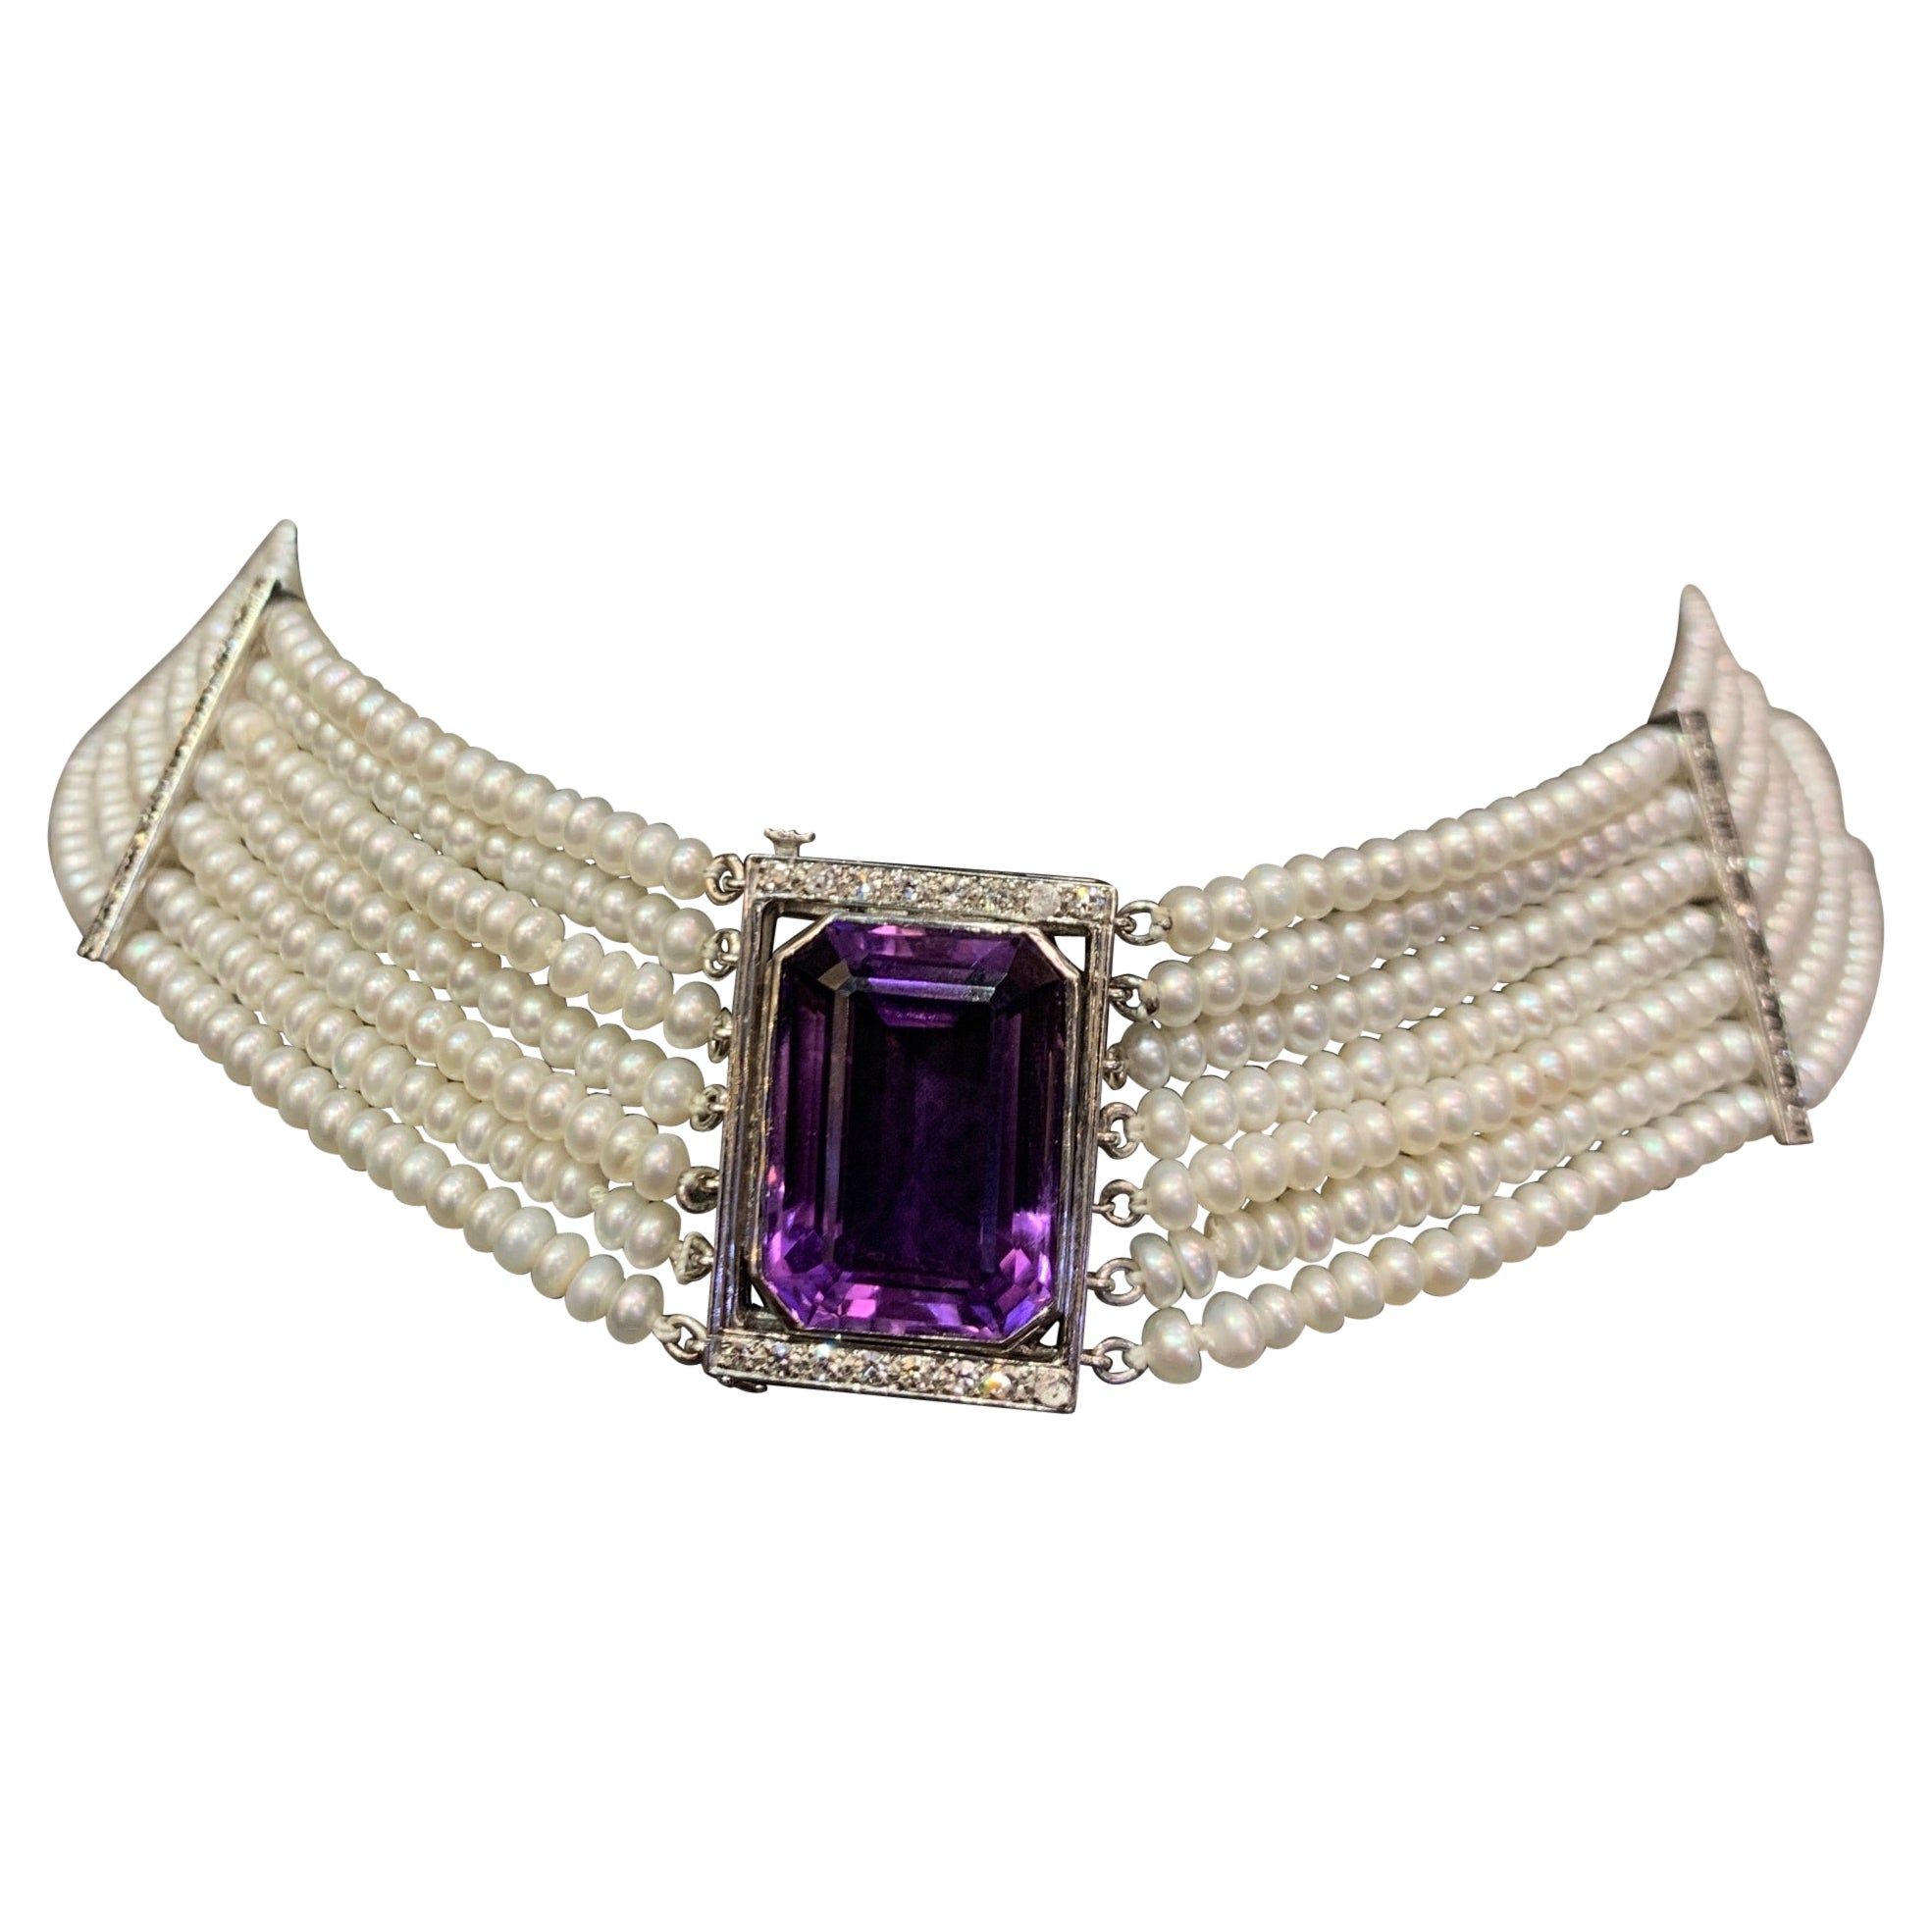 Pearl Multi Strand & Amethyst Choker Necklace